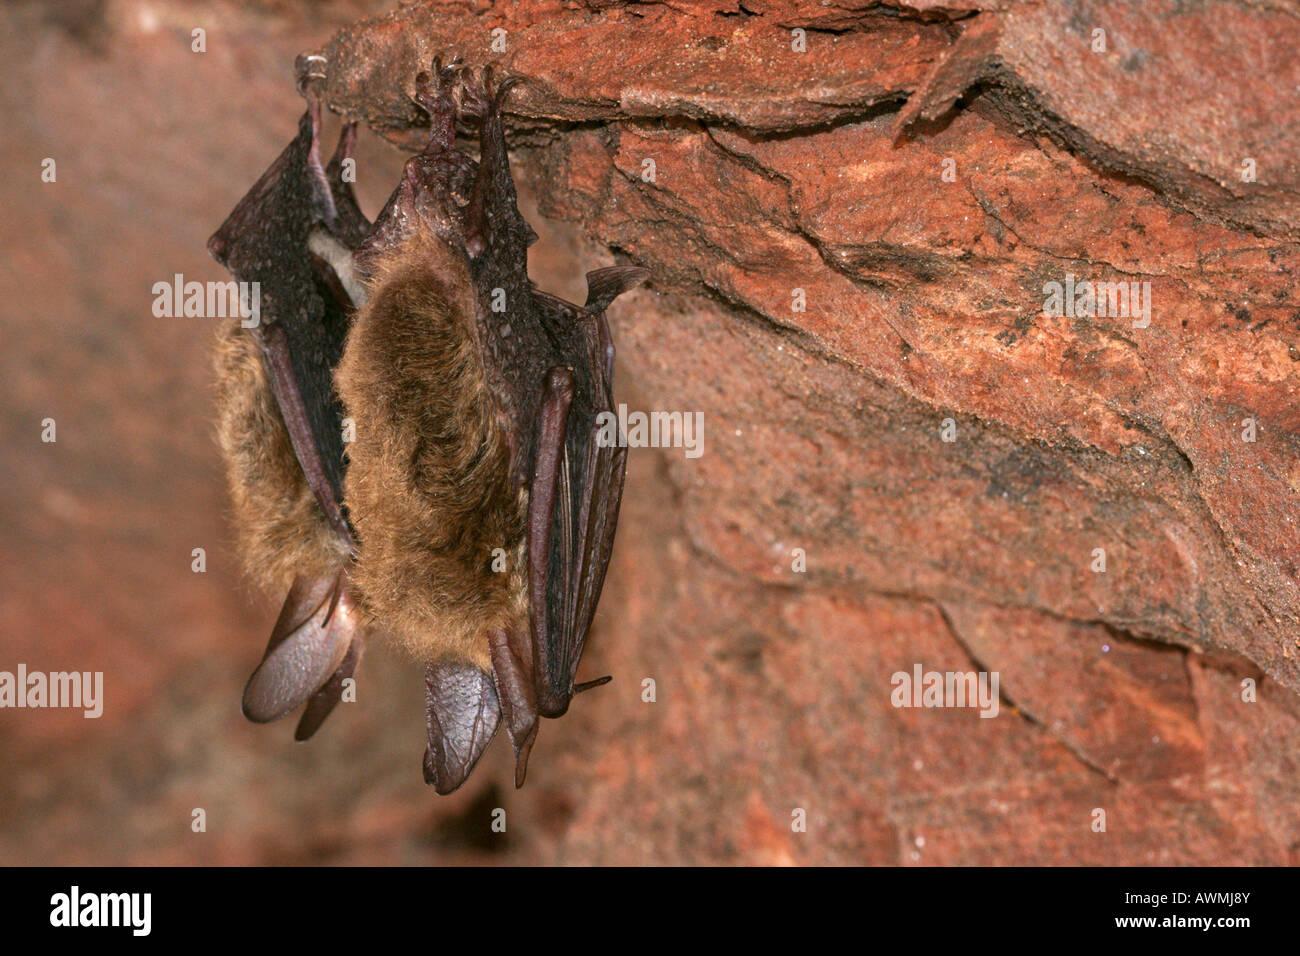 Bechstein's bat (Myotis bechsteinii) hibernating in a cave - Stock Image